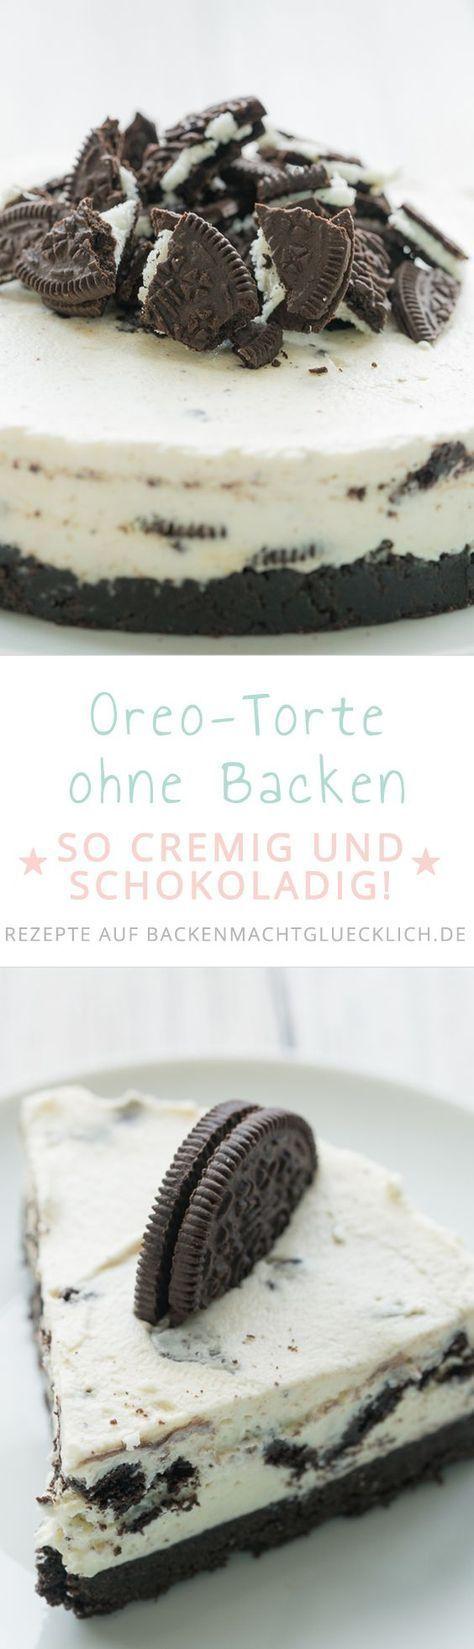 oreo torte ohne backen rezept tiere pinterest. Black Bedroom Furniture Sets. Home Design Ideas